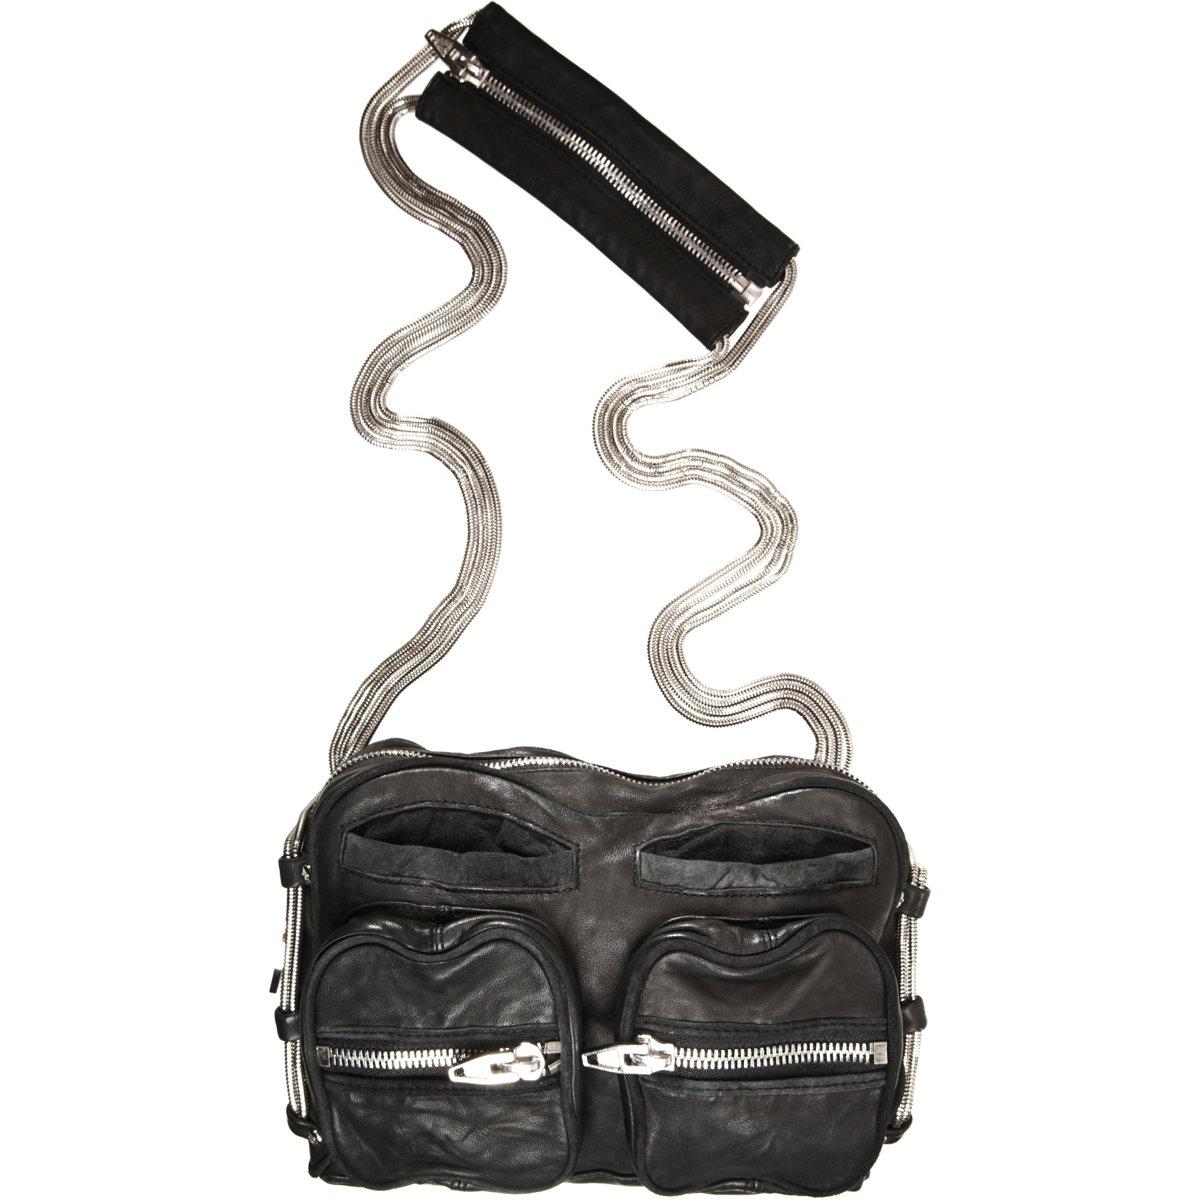 Alexander Wang Brenda Shoulder Bag at Barneys.com